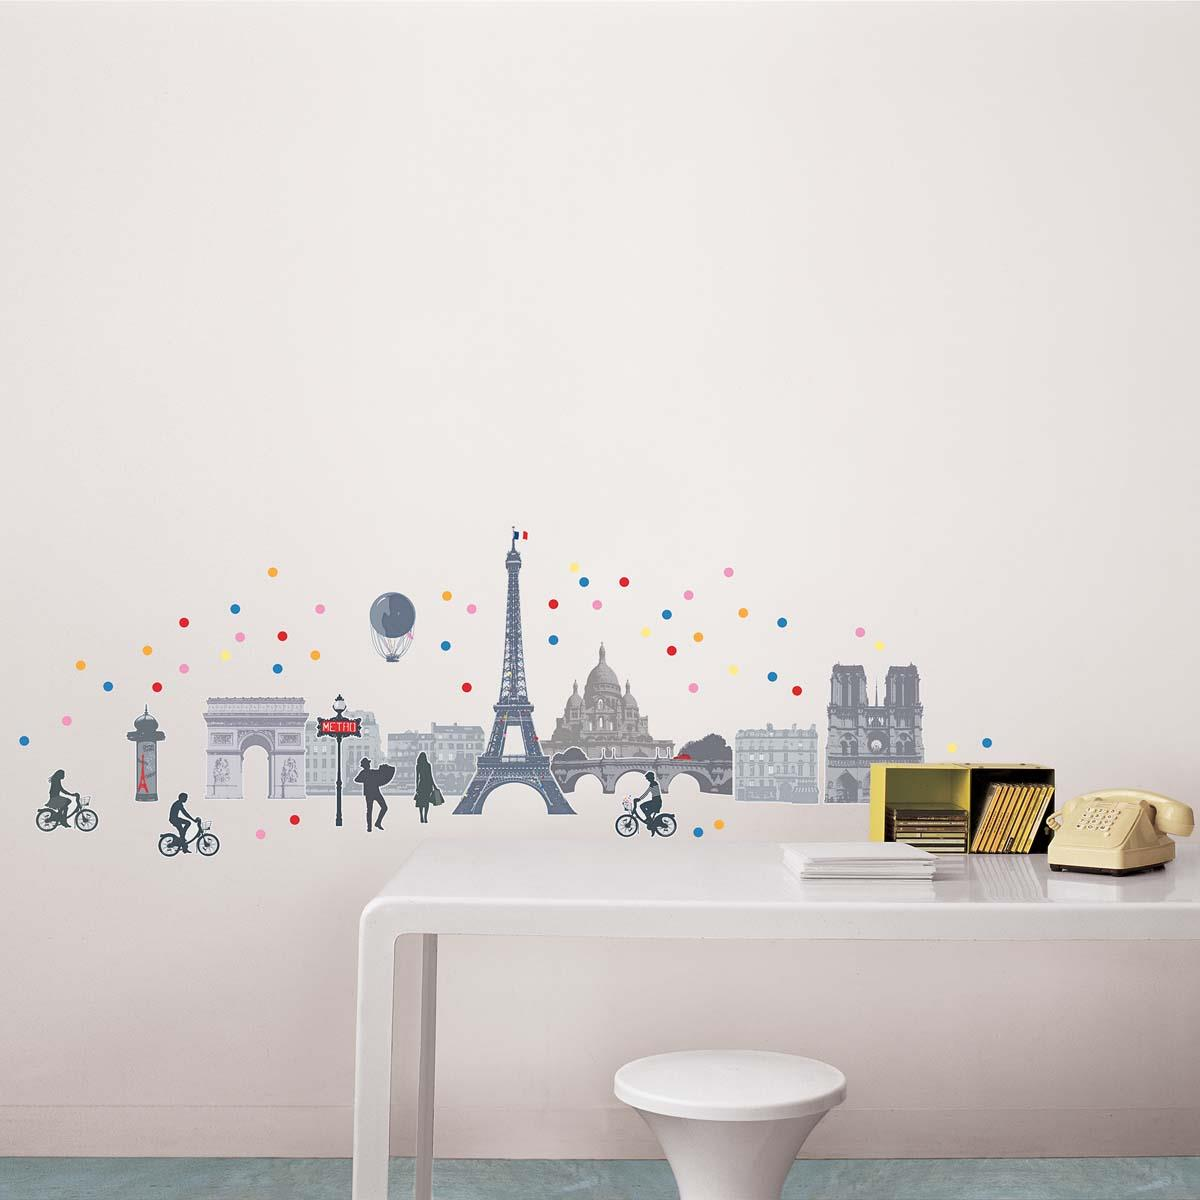 Ref-170-002025-03-5-DRAEGER-Lot-de-5-Stickers-mural-Paris-Multicolore